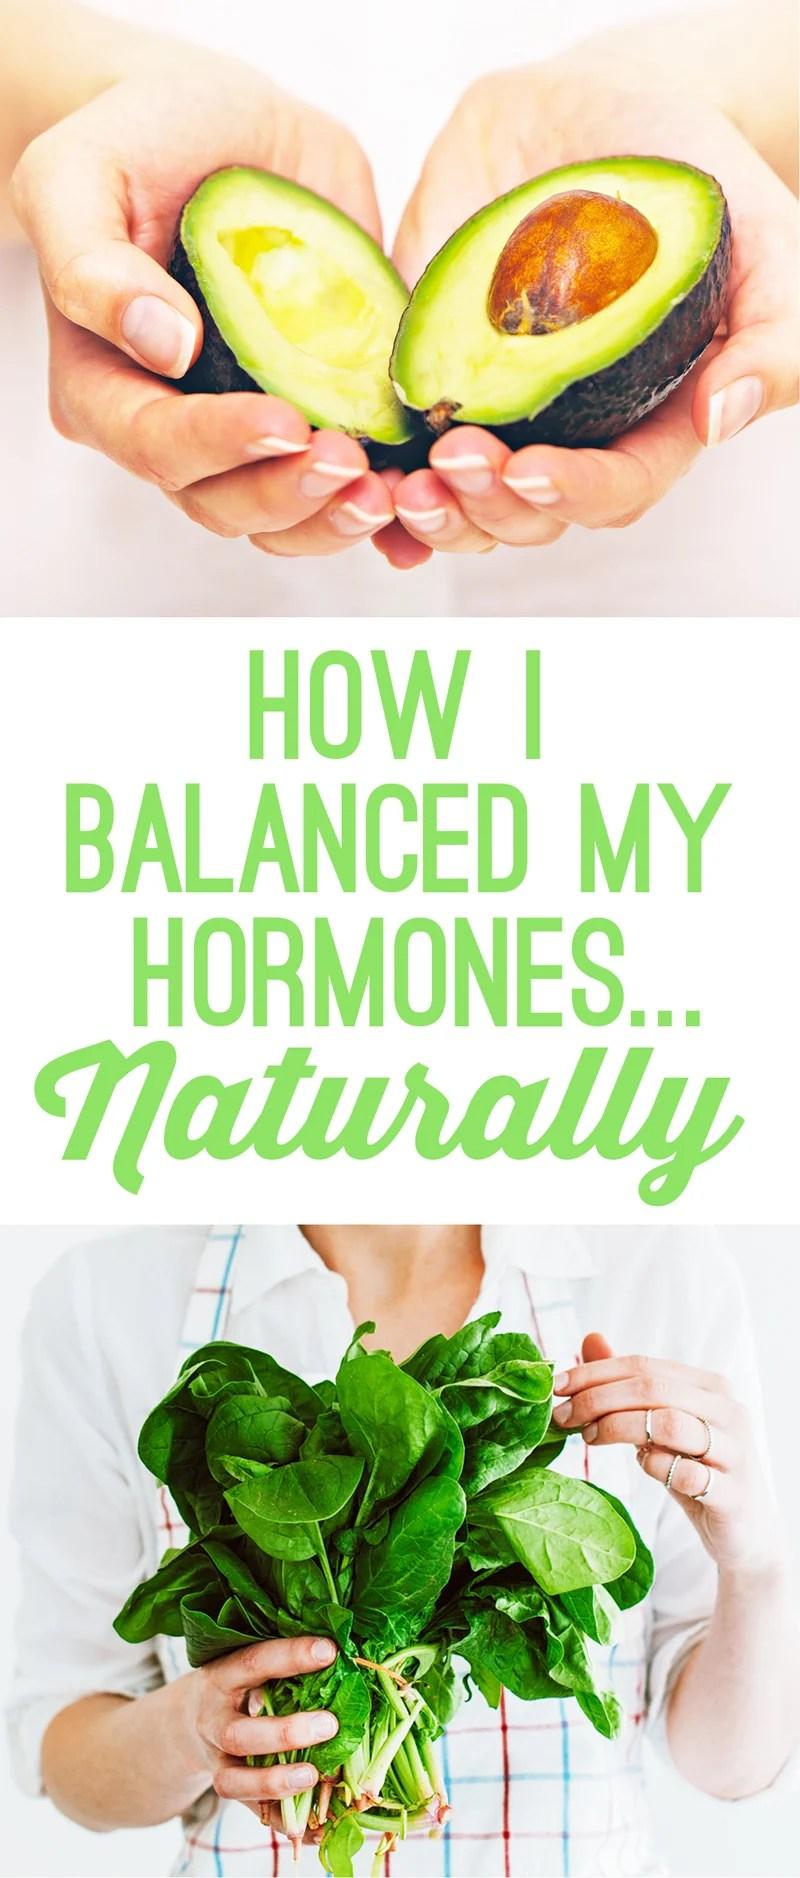 How I Balanced My Hormones Naturally